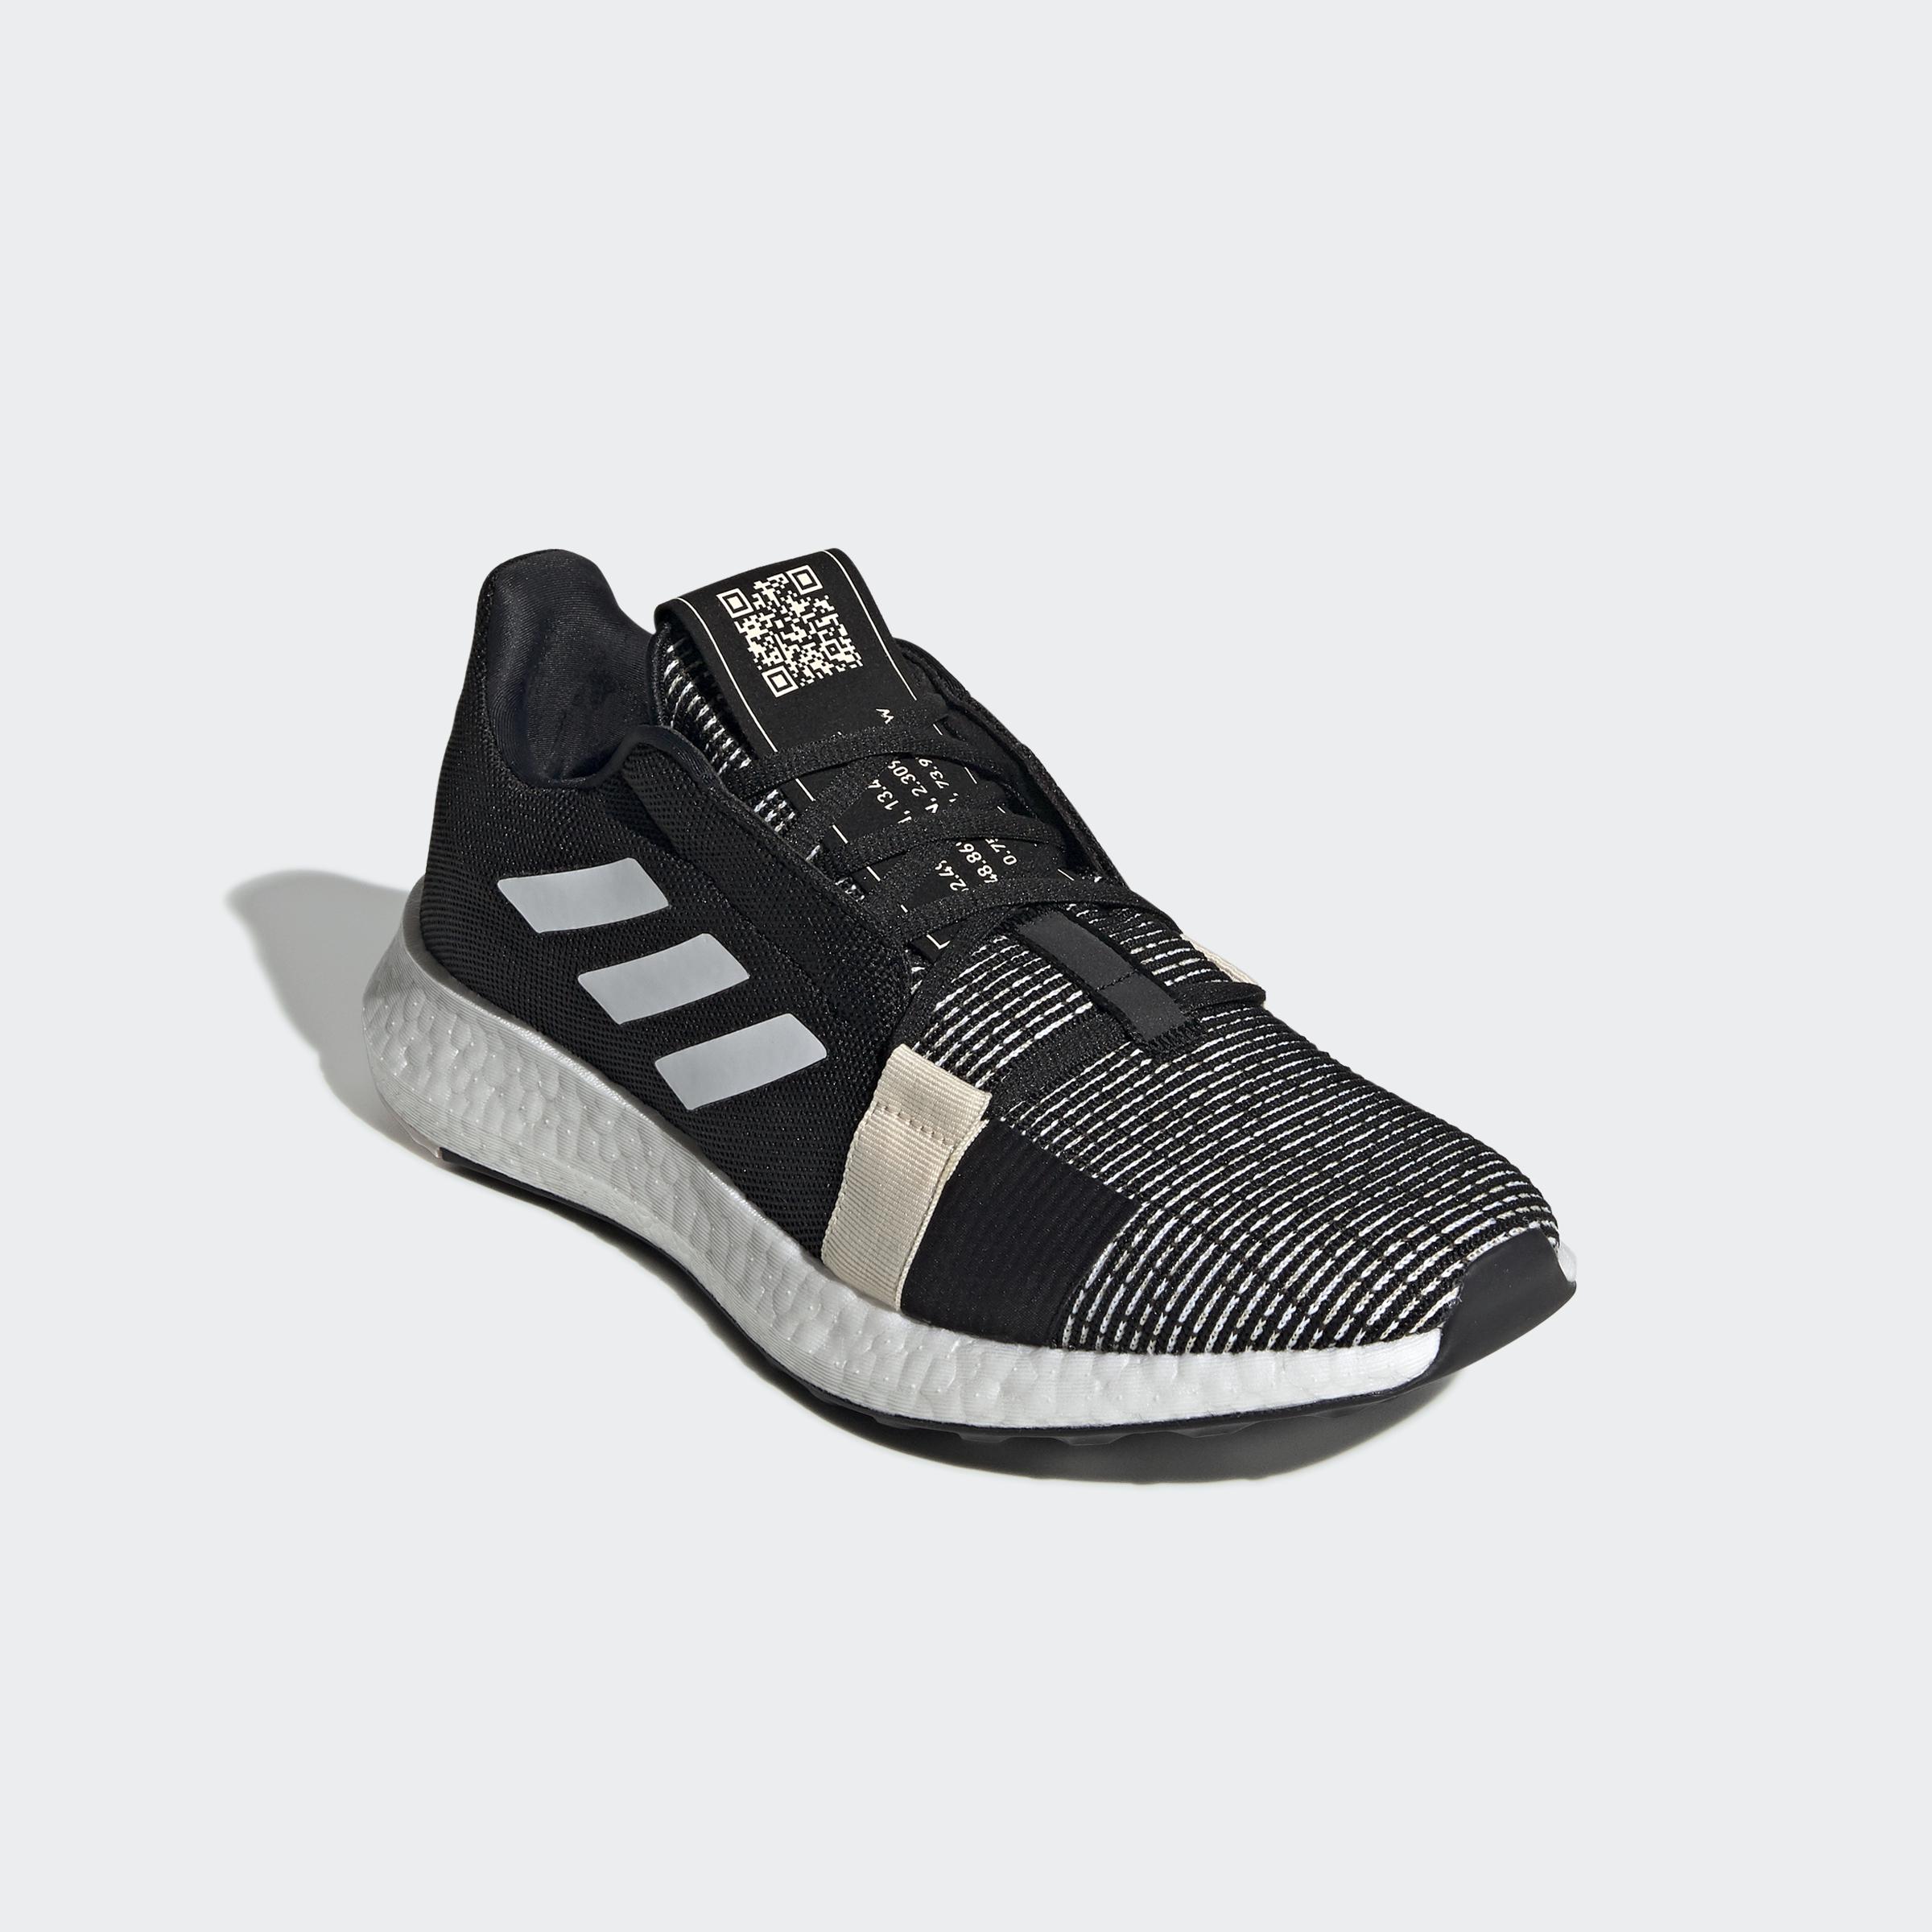 miniature 43 - adidas Senseboost Go Shoes Men's Athletic & Sneakers